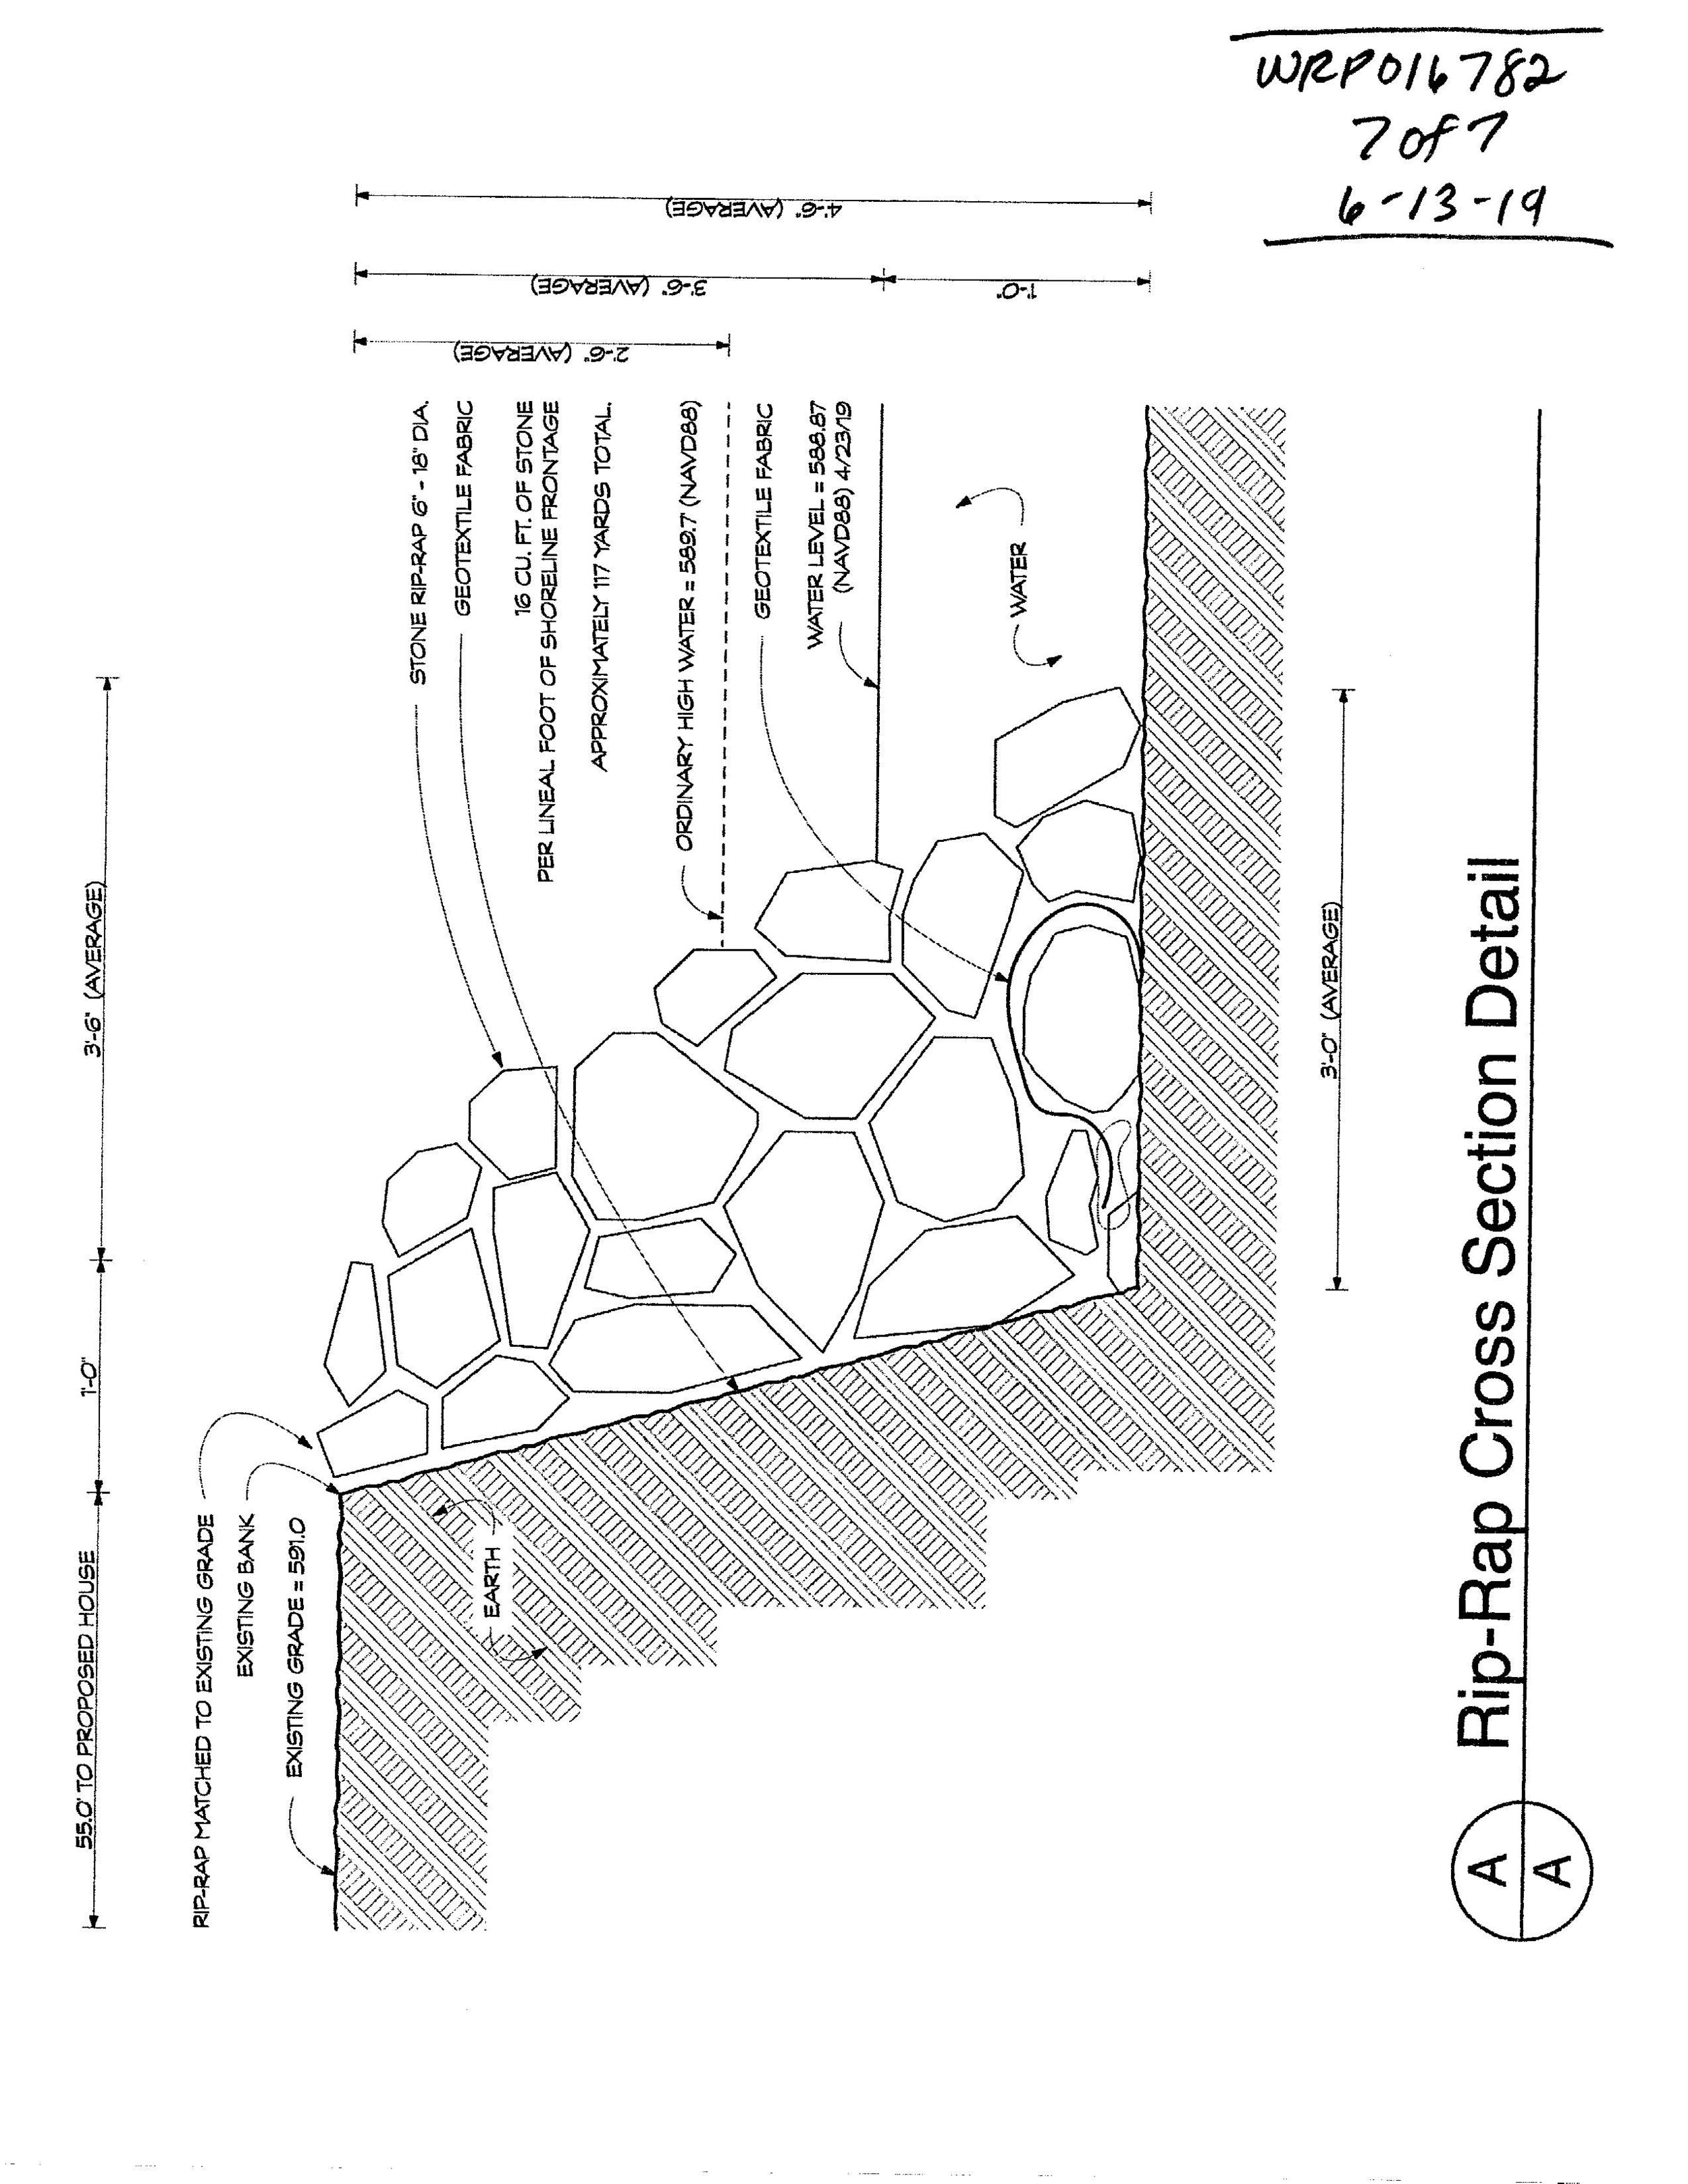 4388 N Manitou Trail, Leland - Marketing packet by Oltersdorf Realty LLC (36).jpg